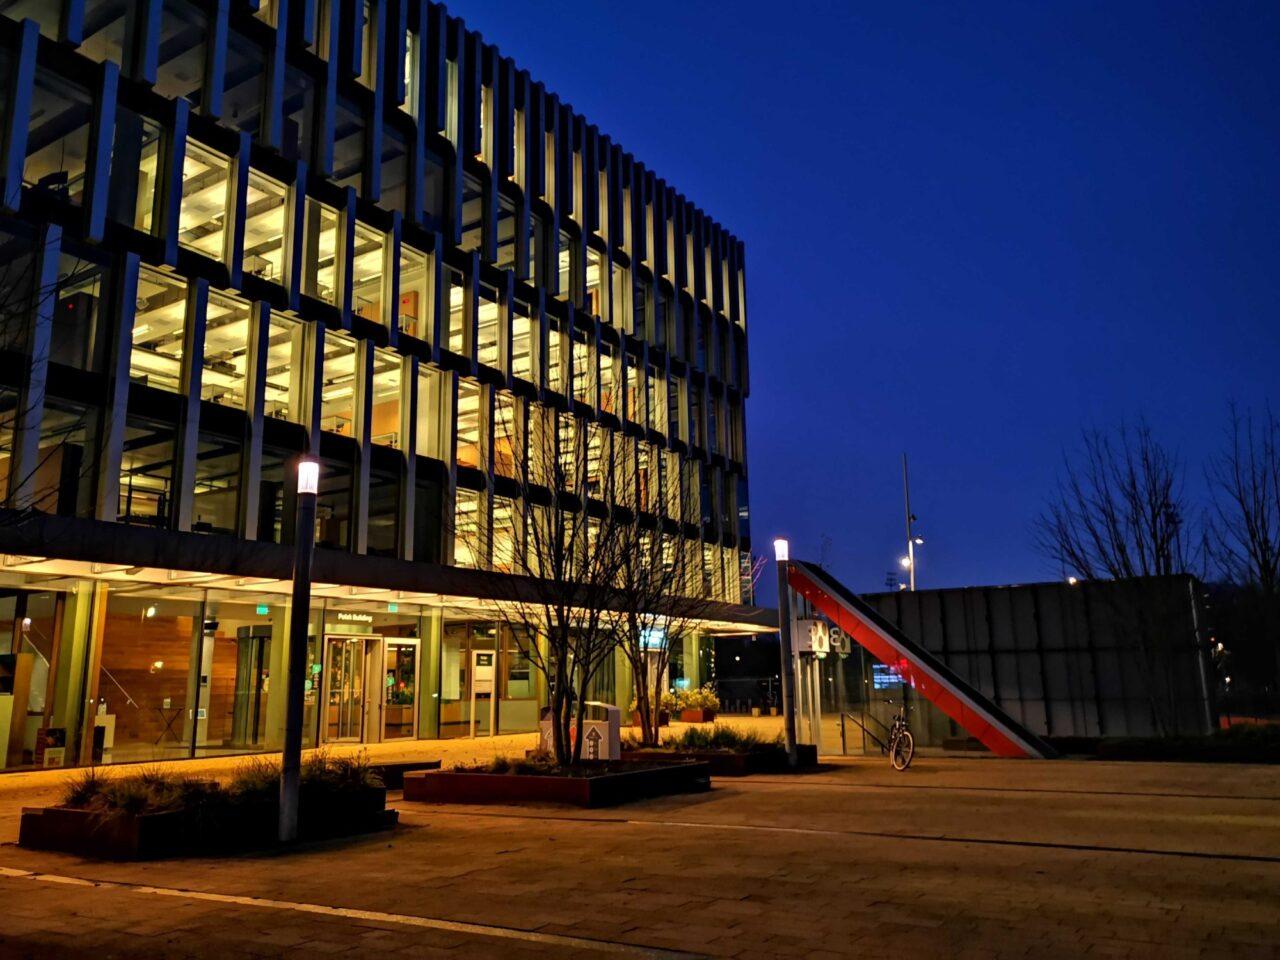 polakgebouw-leeg-campus-corona-donker-ochtend-foto-Tessa-Hofland-EM